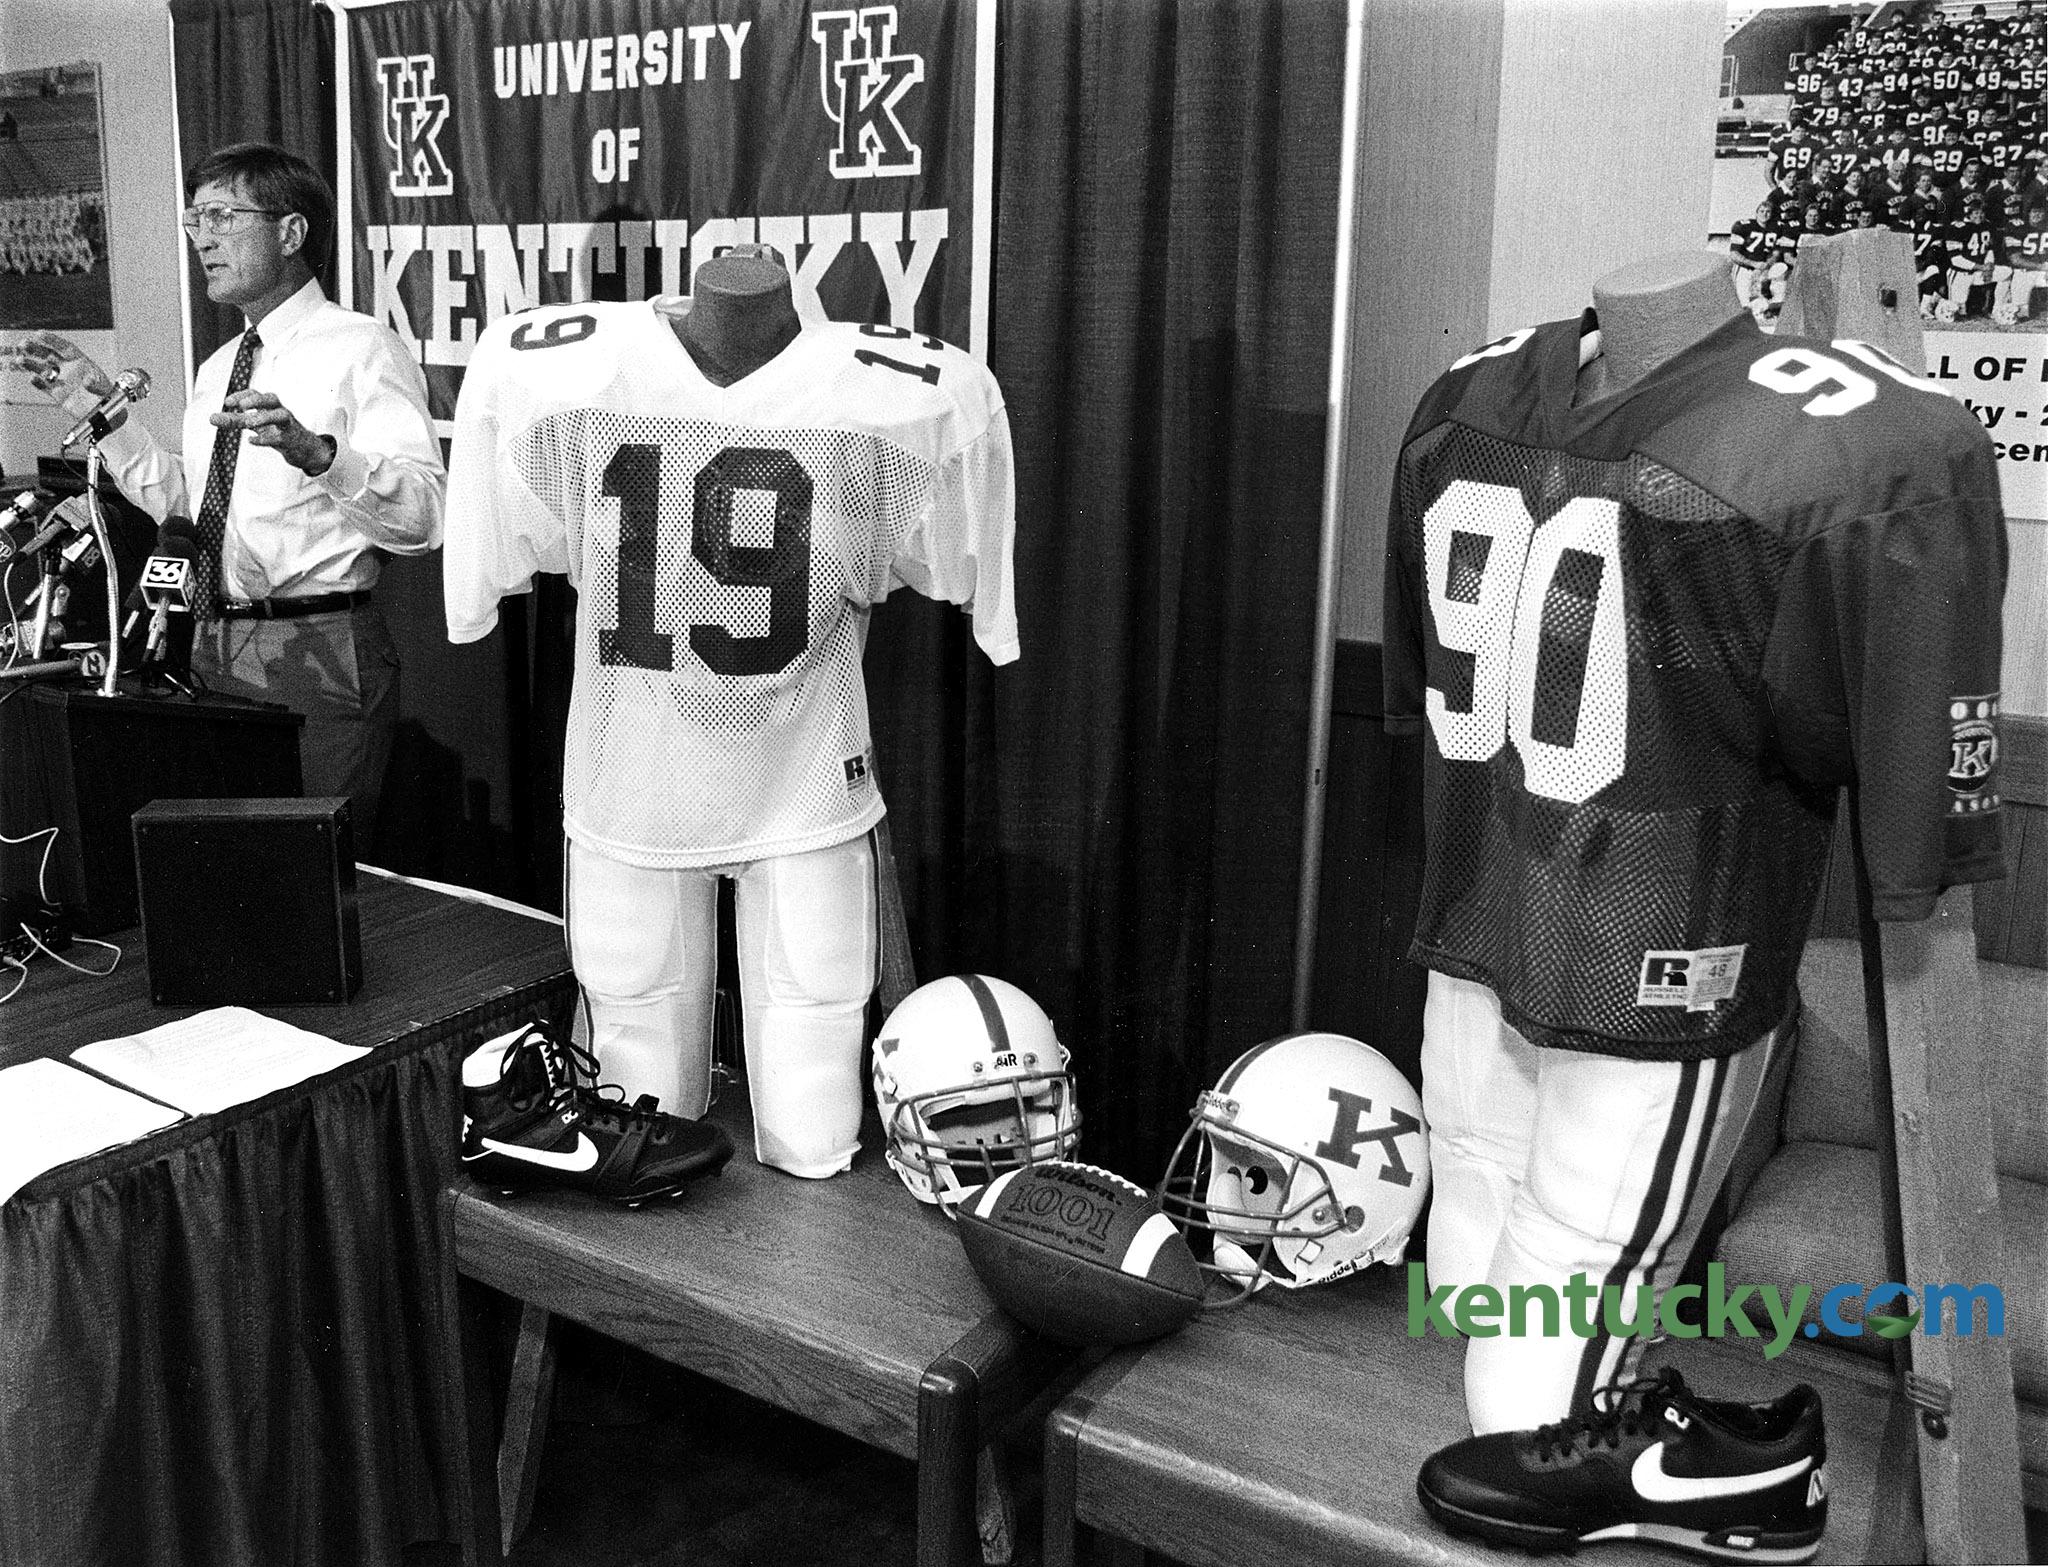 New Uk Football Uniforms 1990 Kentucky Photo Archive